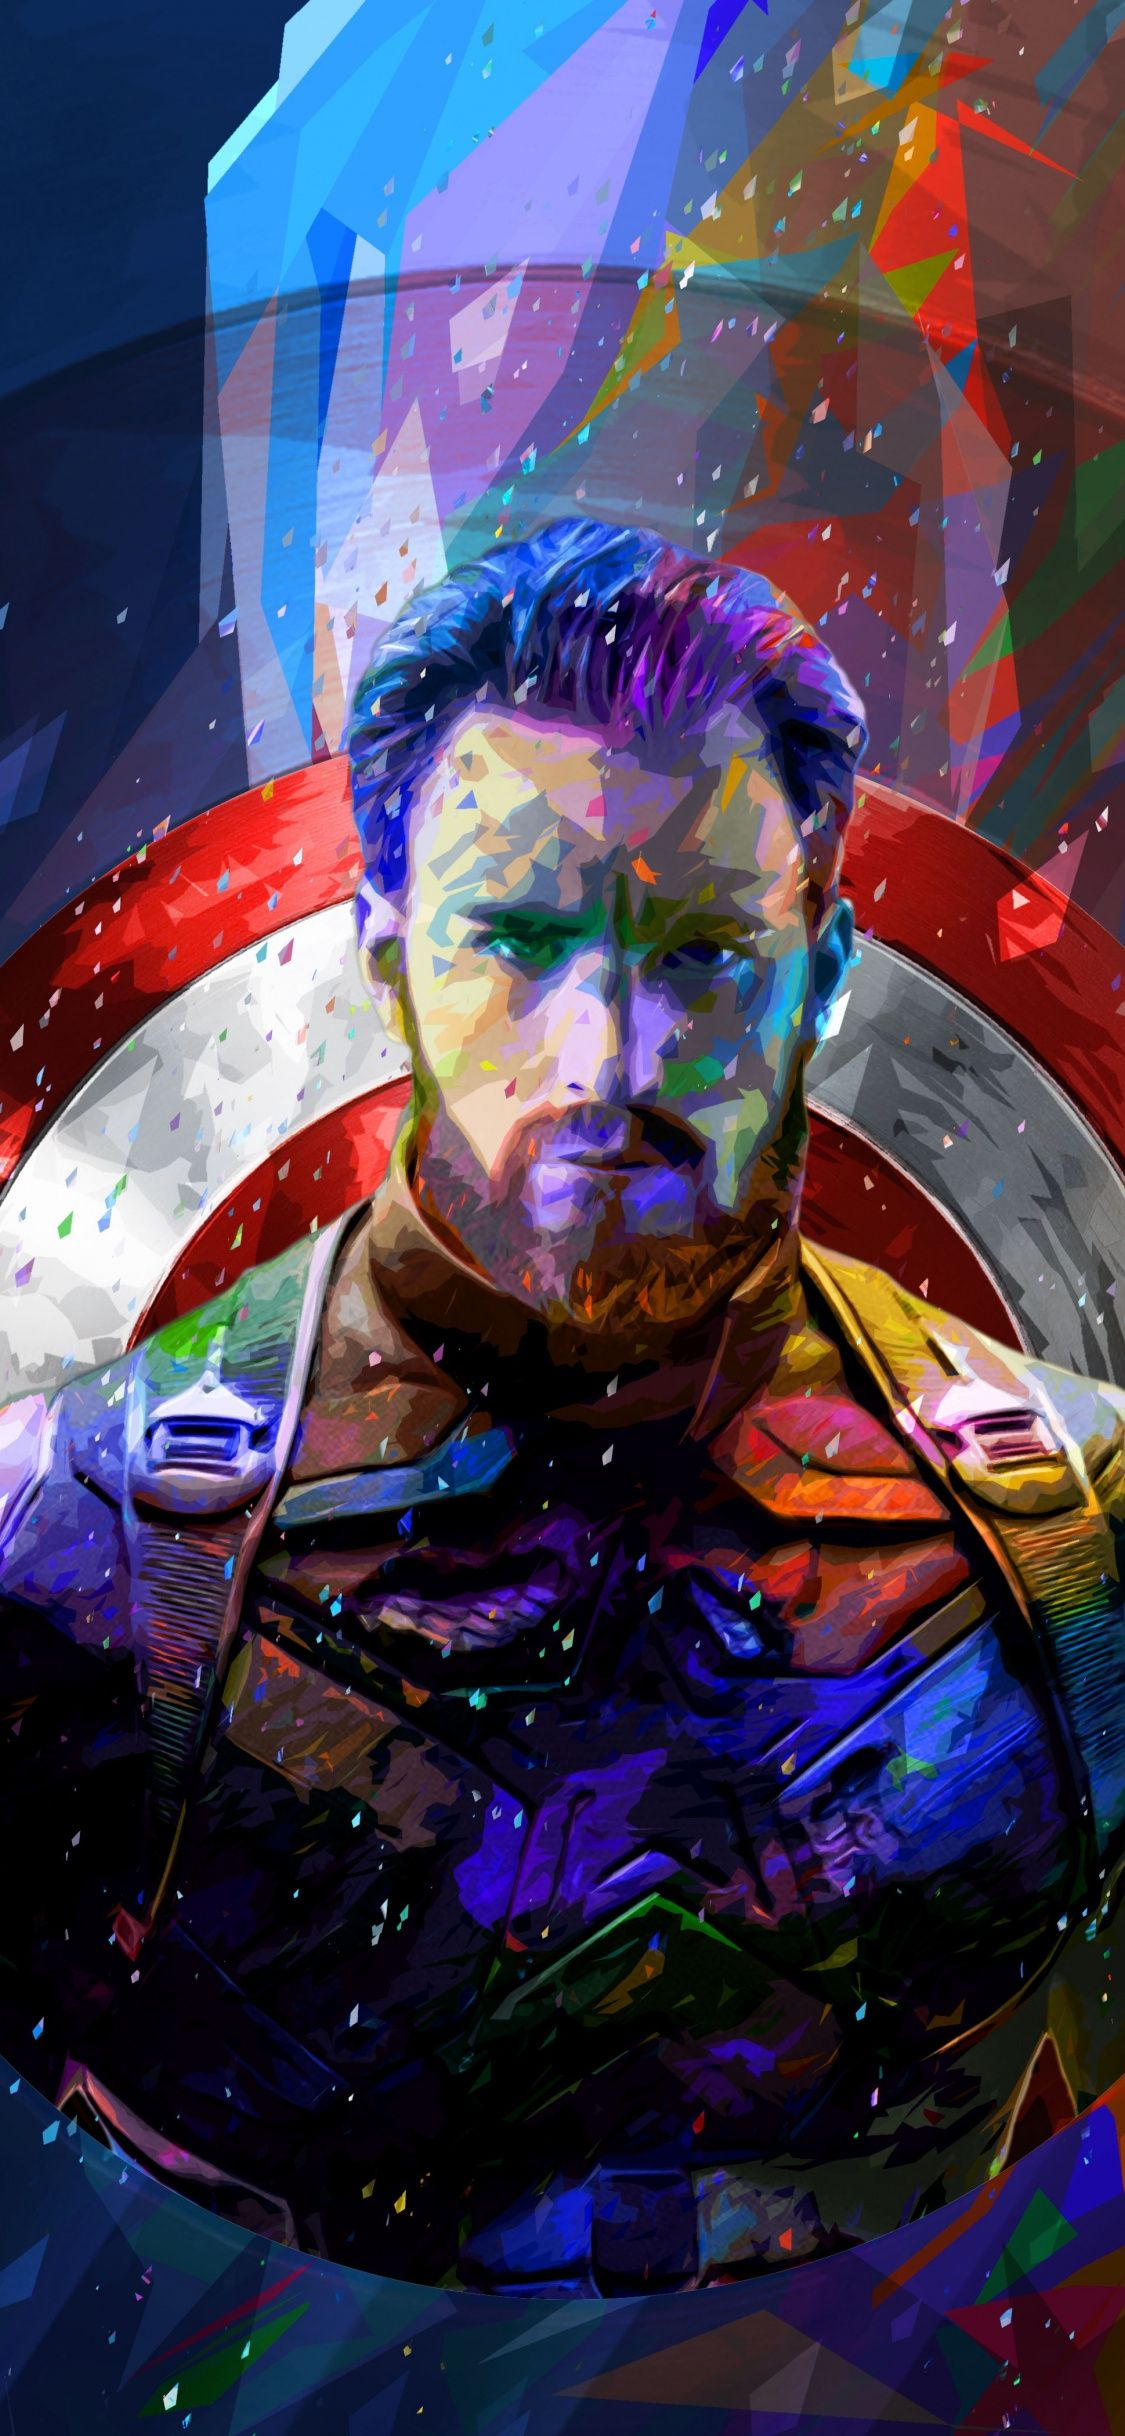 Captain America Colorful Art 1125x2436 Wallpaper Superhero Wallpaper Captain America Wallpaper Abstract Art Wallpaper